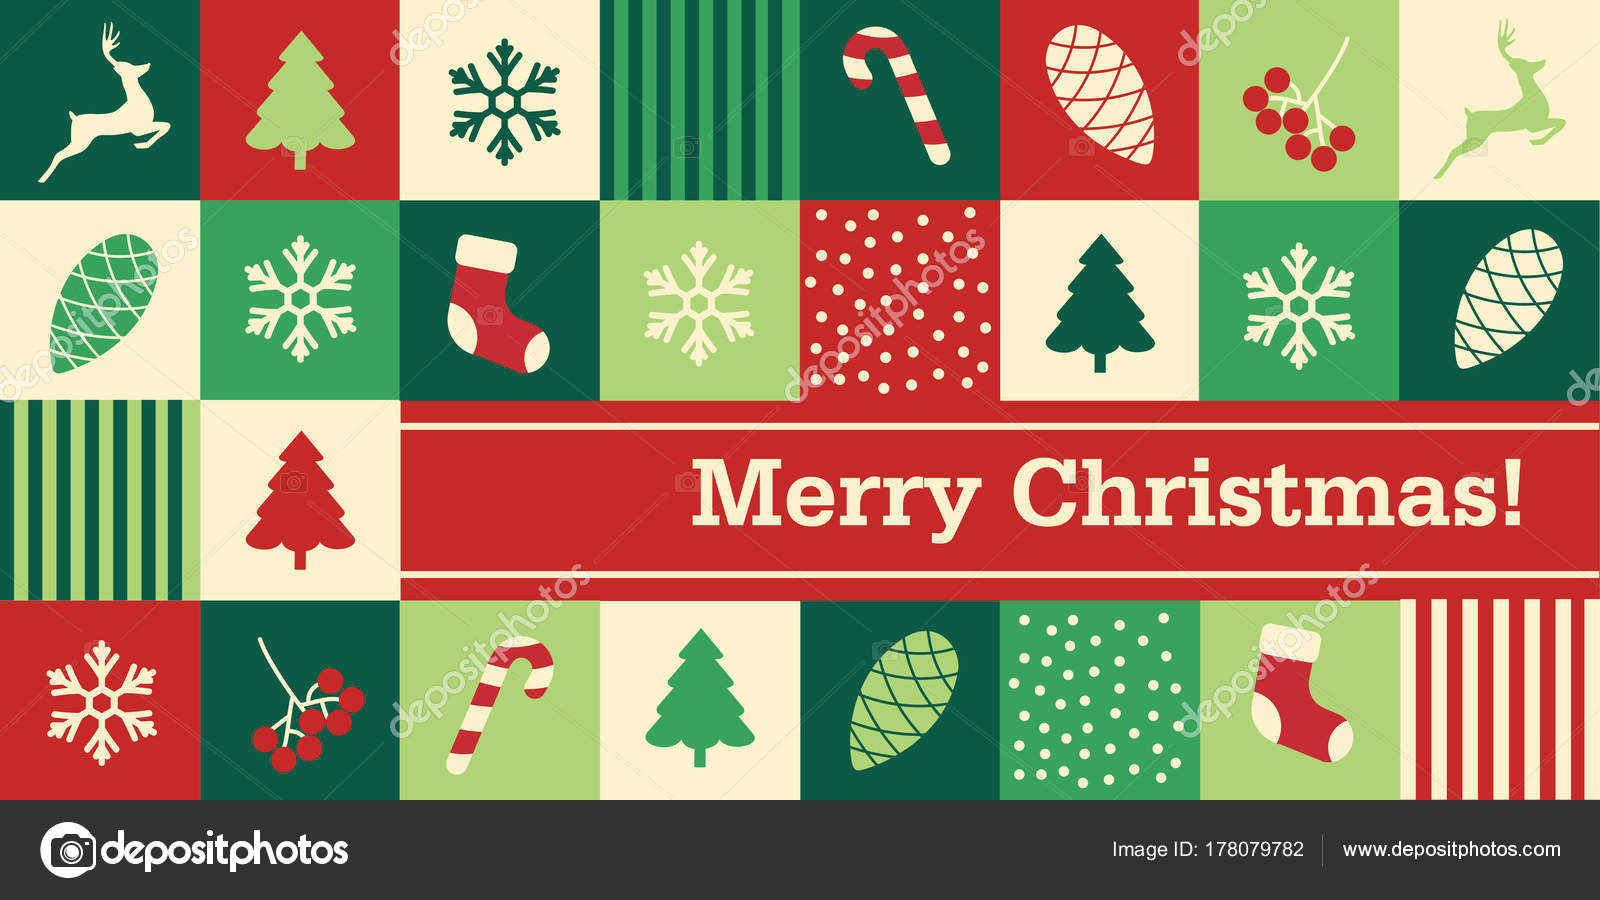 depositphotos 178079782 stock illustration vintage christmas card seamless pattern